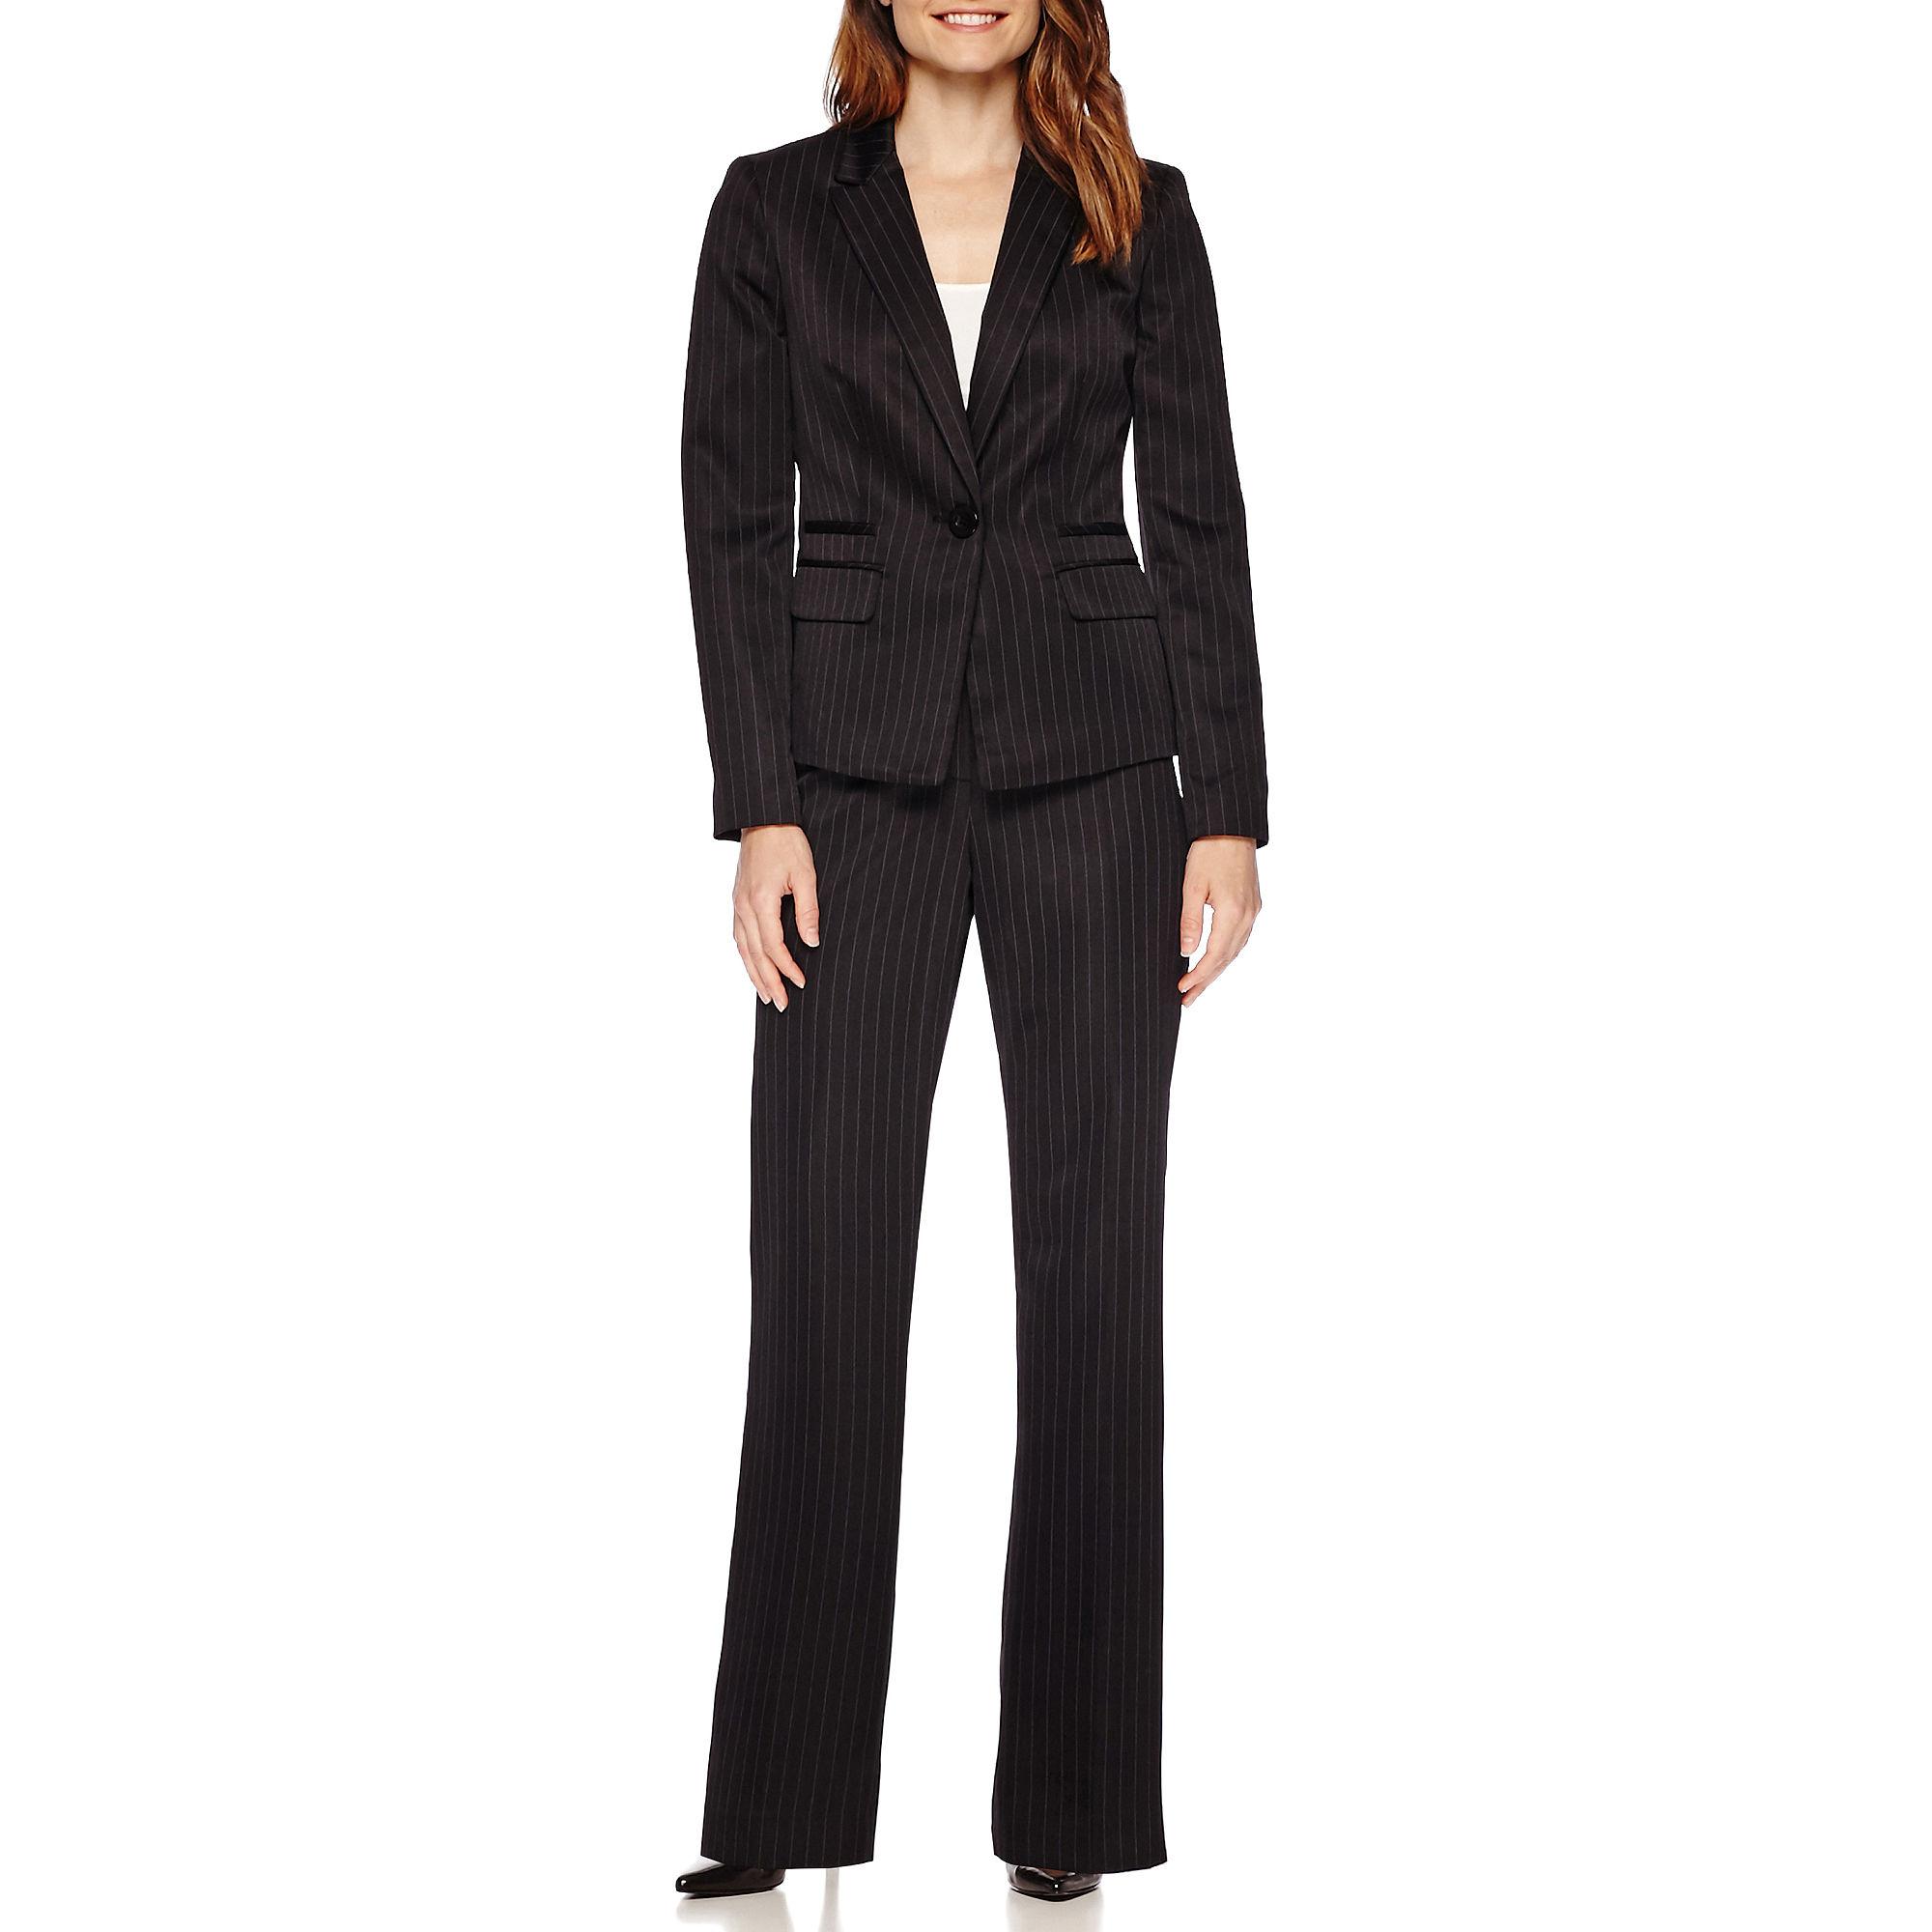 Brilliant  Black Military Long Jacket StraightLeg Women39s Size 2 Pant Suit 320